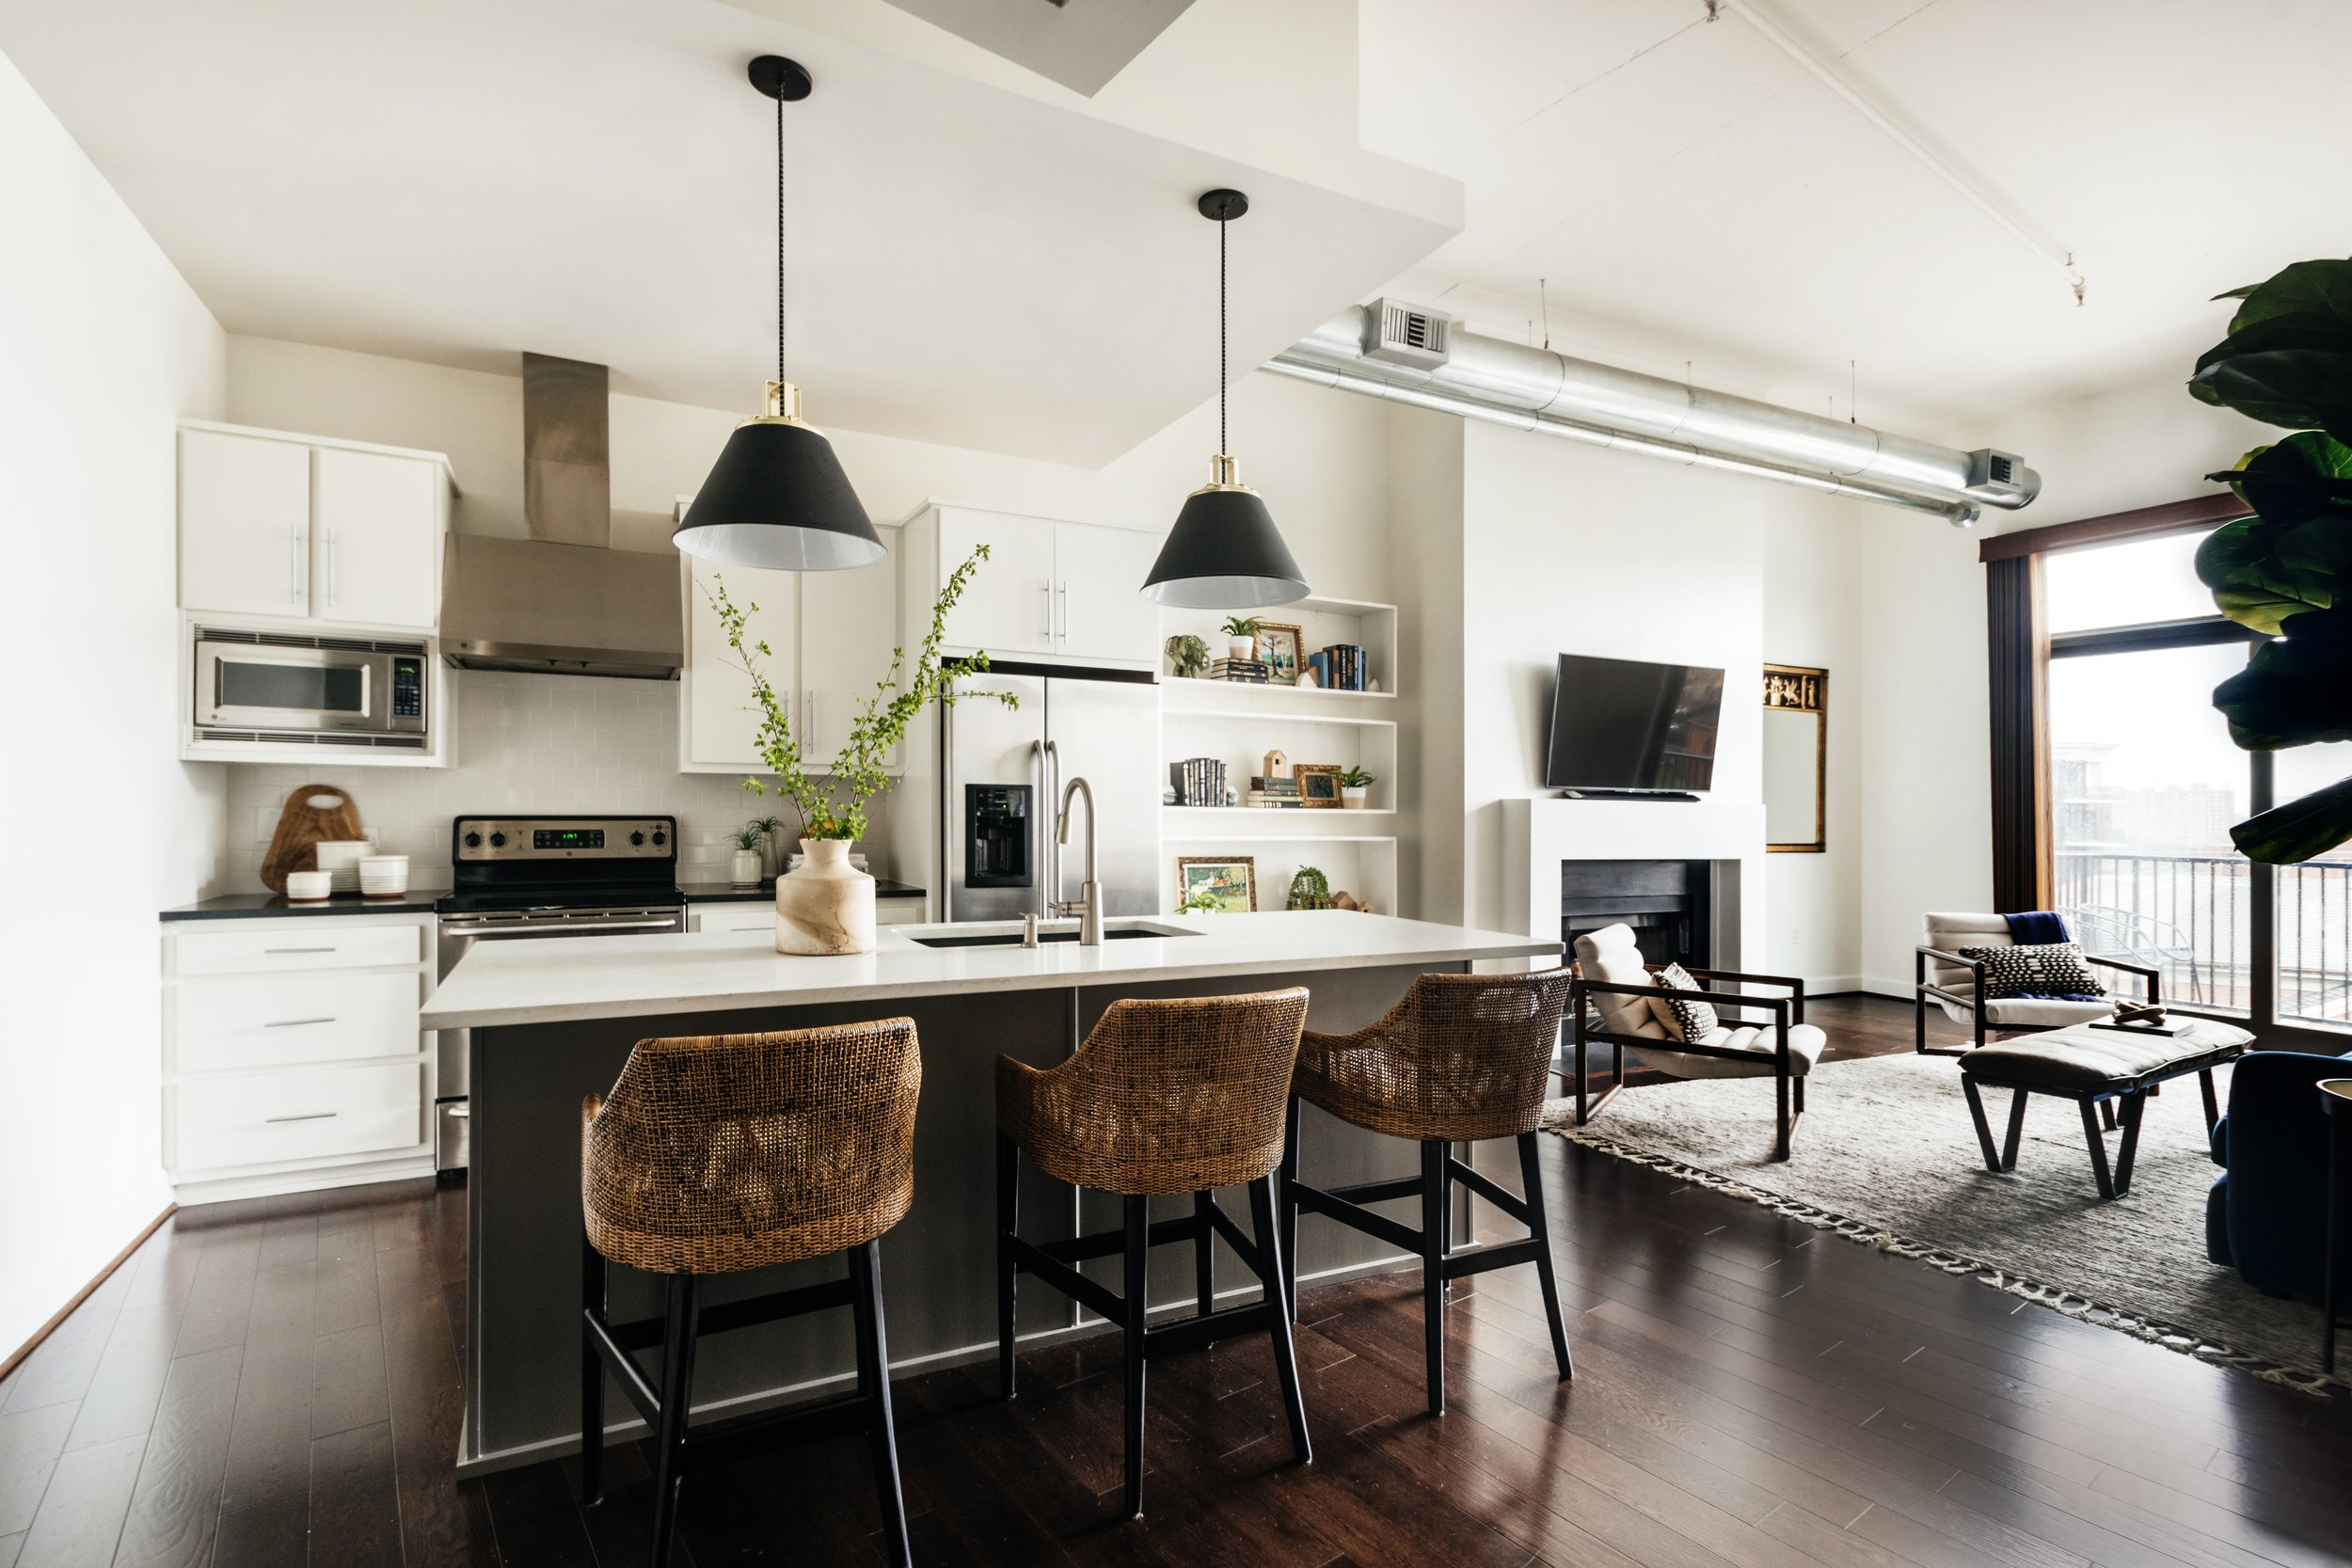 Megan Holt Interiors_Centennial Loft_Quinn Ballard Nashville Interior Photographer-Kitchen Living Room Composite.jpg